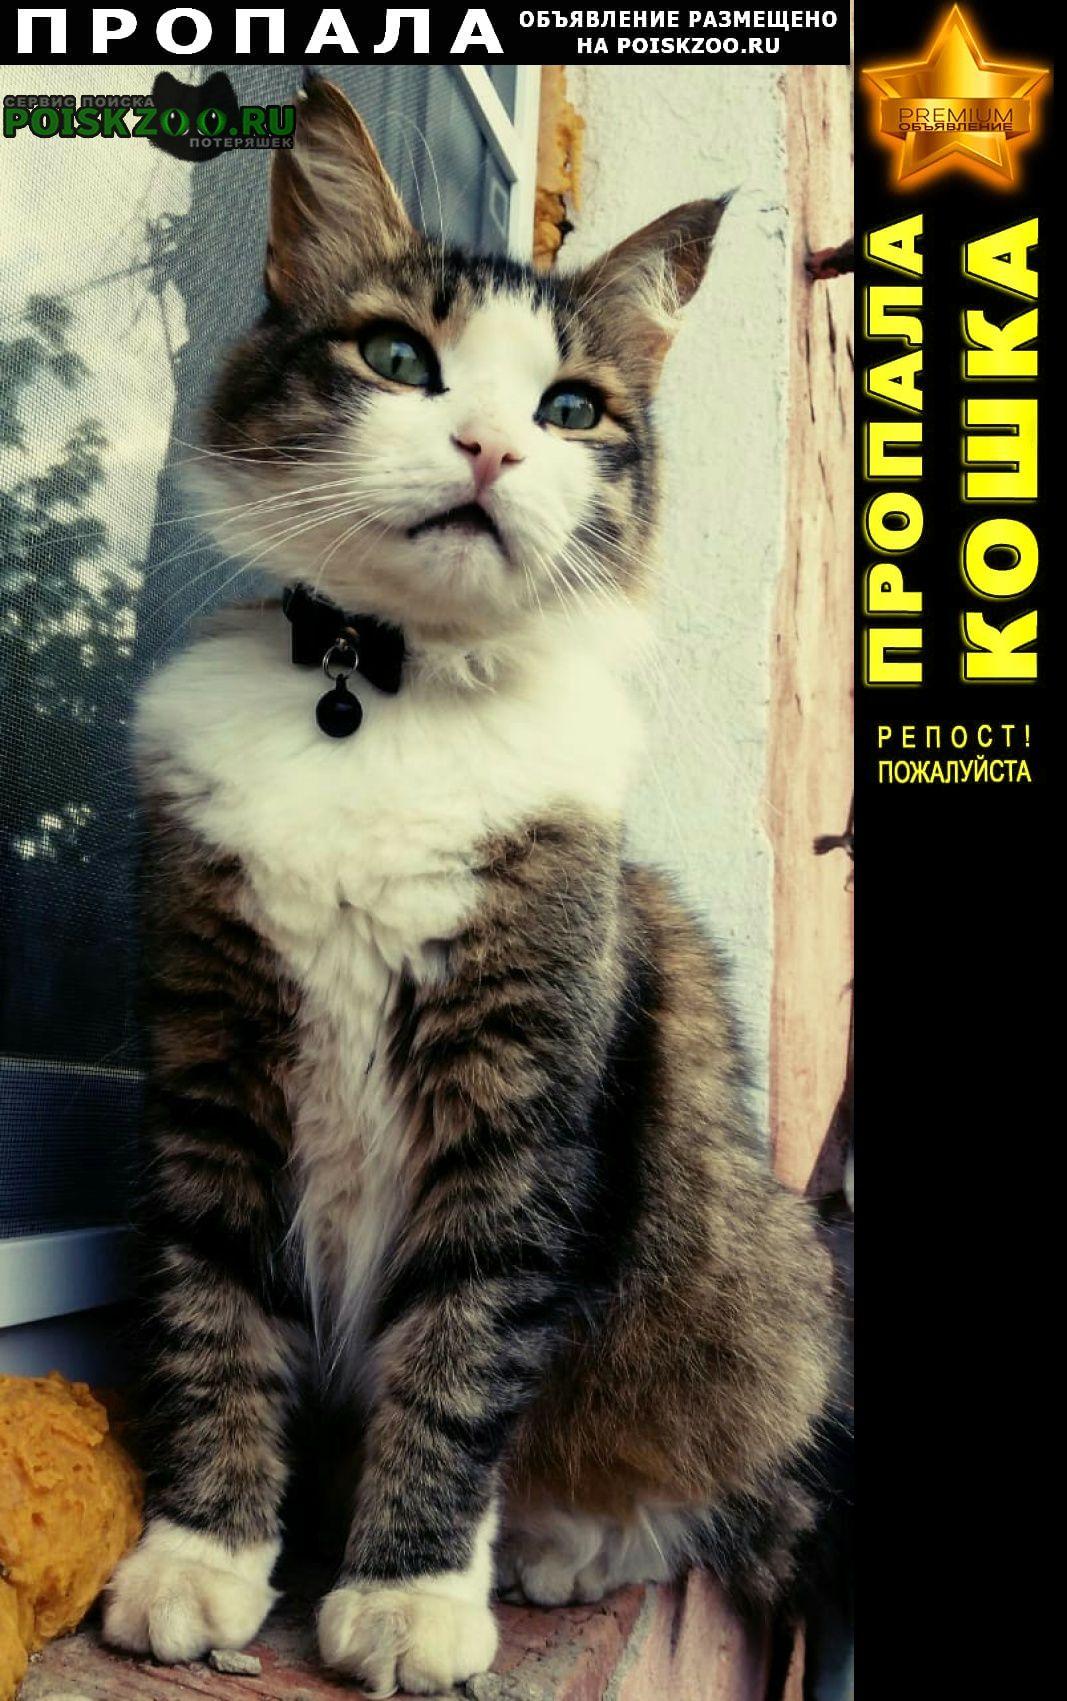 Пропала кошка помогите найти кота «васю» Хотьково